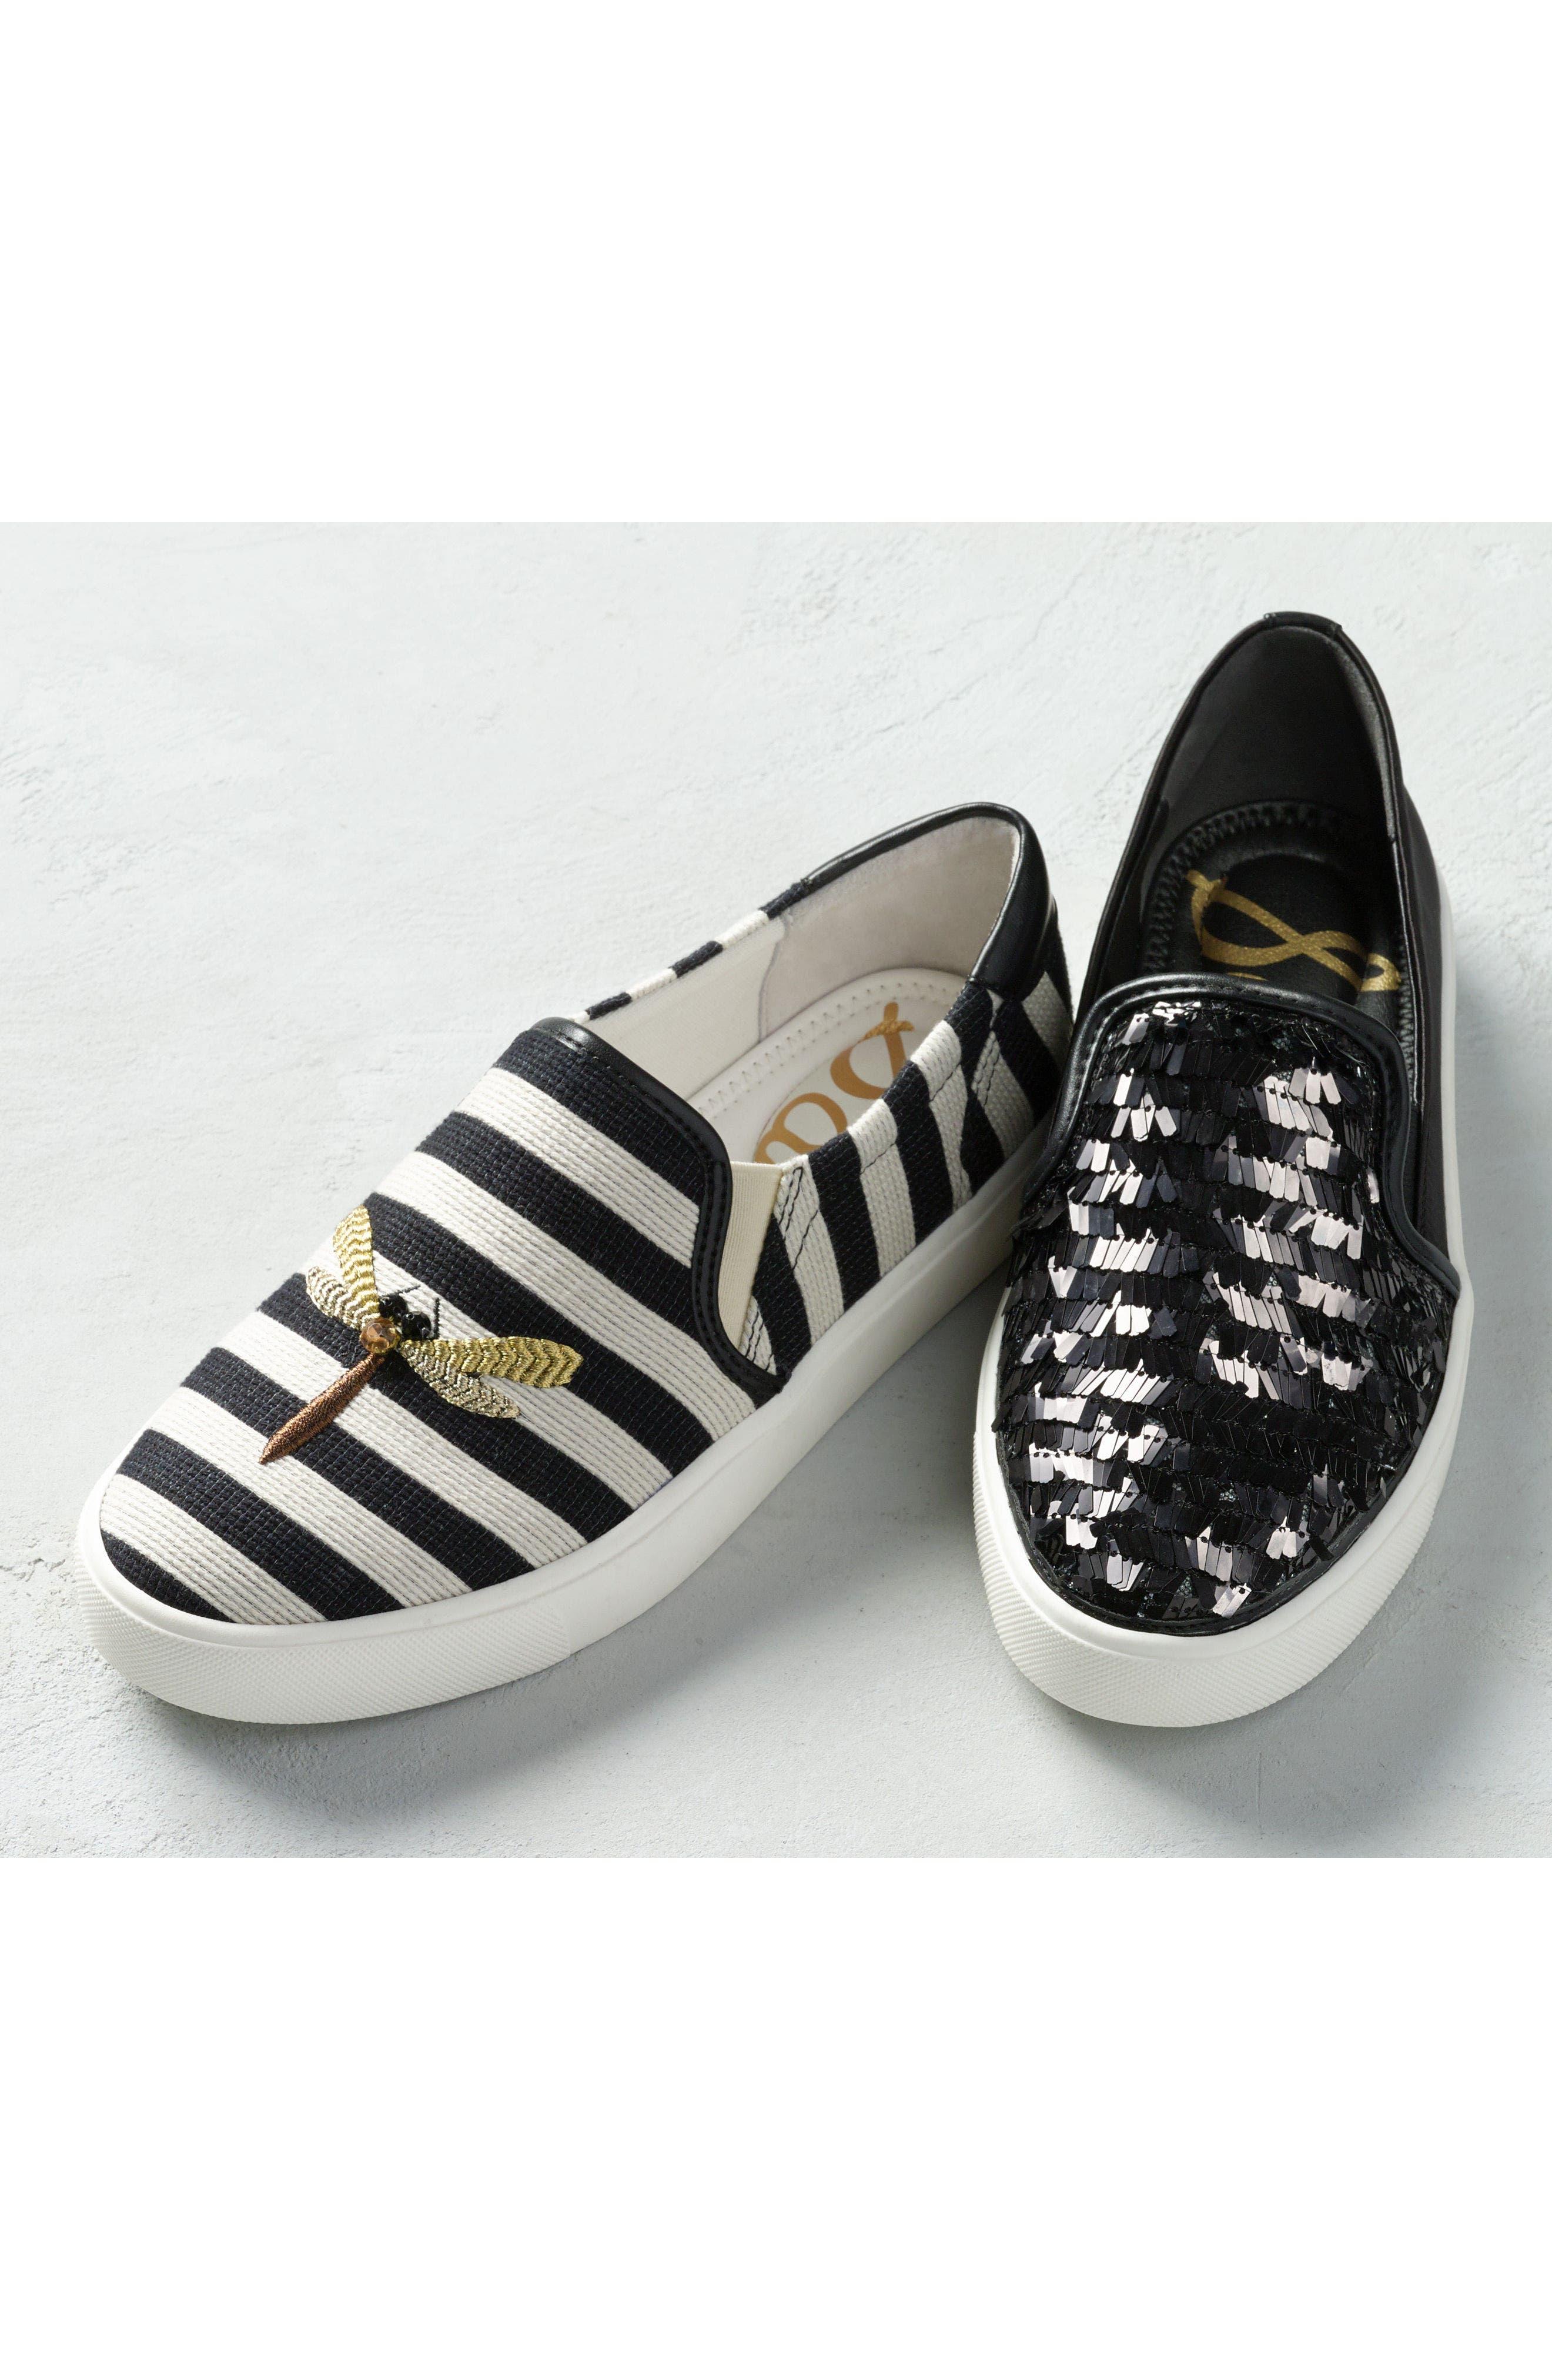 Elton Slip-On Sneaker,                             Alternate thumbnail 10, color,                             BLACK SUEDE LEATHER